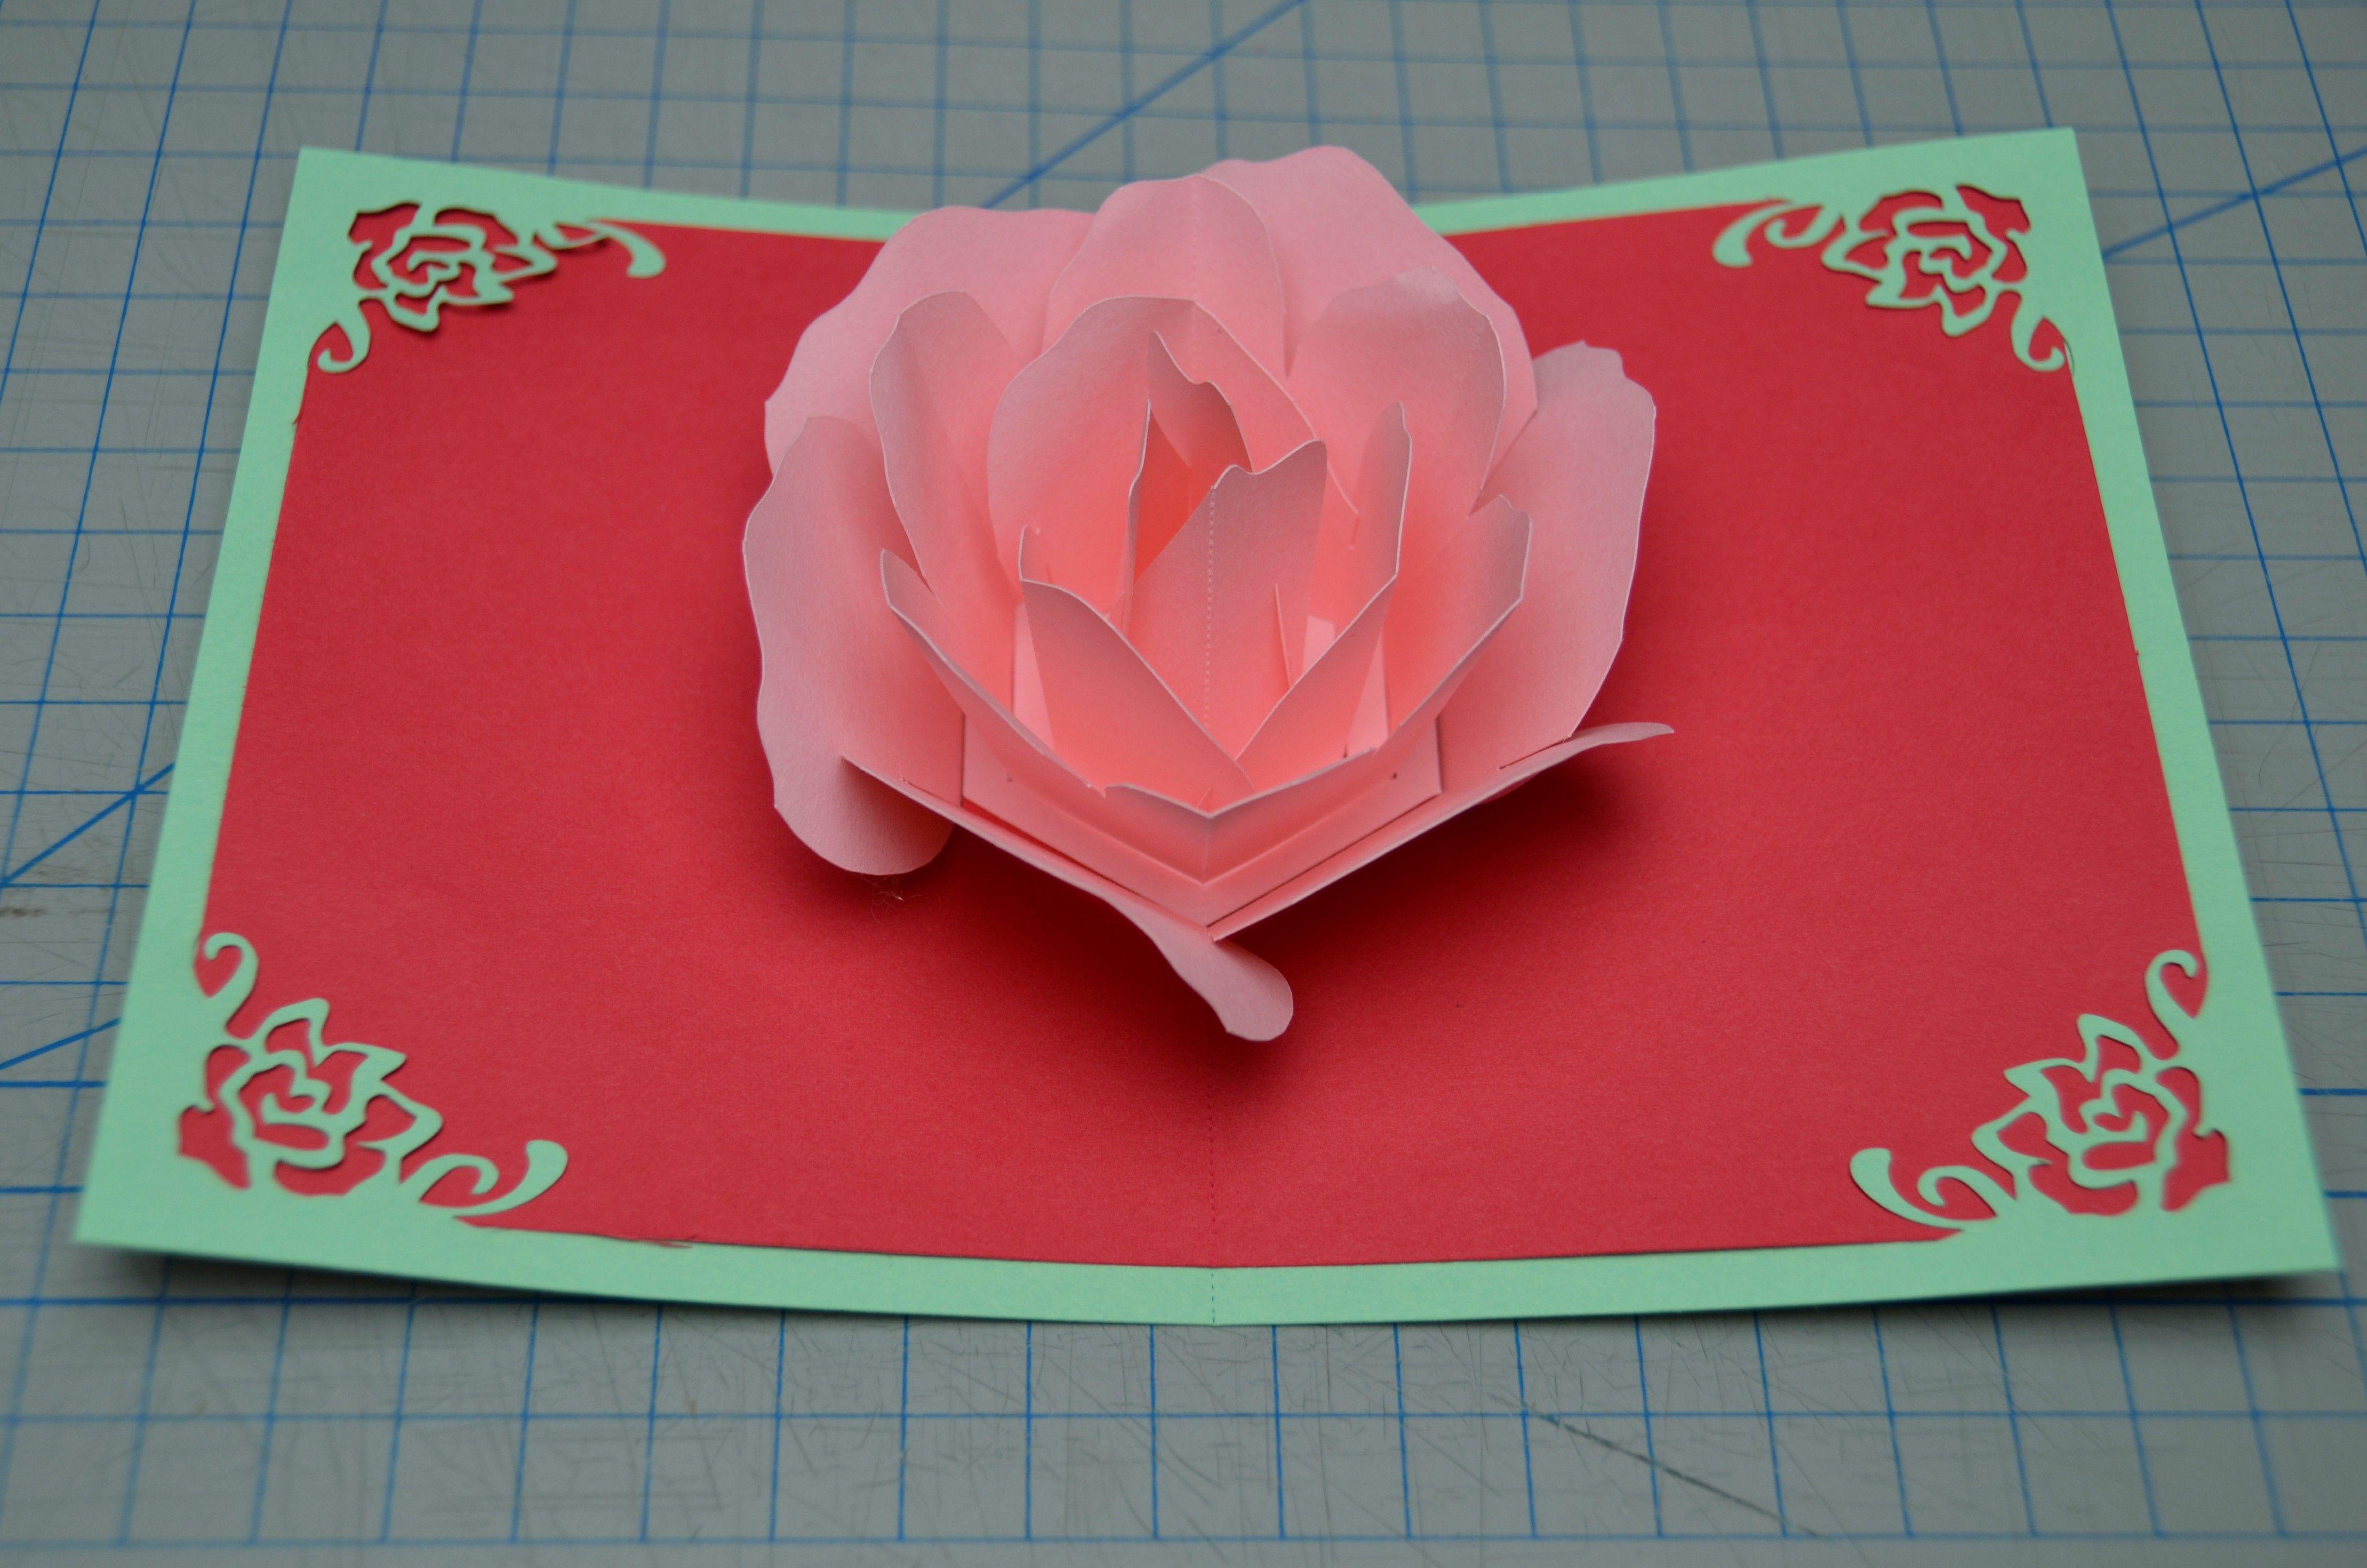 Rose Flower Pop Up Card Tutorial Creative Pop Up Cards Pop Up Cards Pop Up Christmas Cards Diy Pop Up Cards